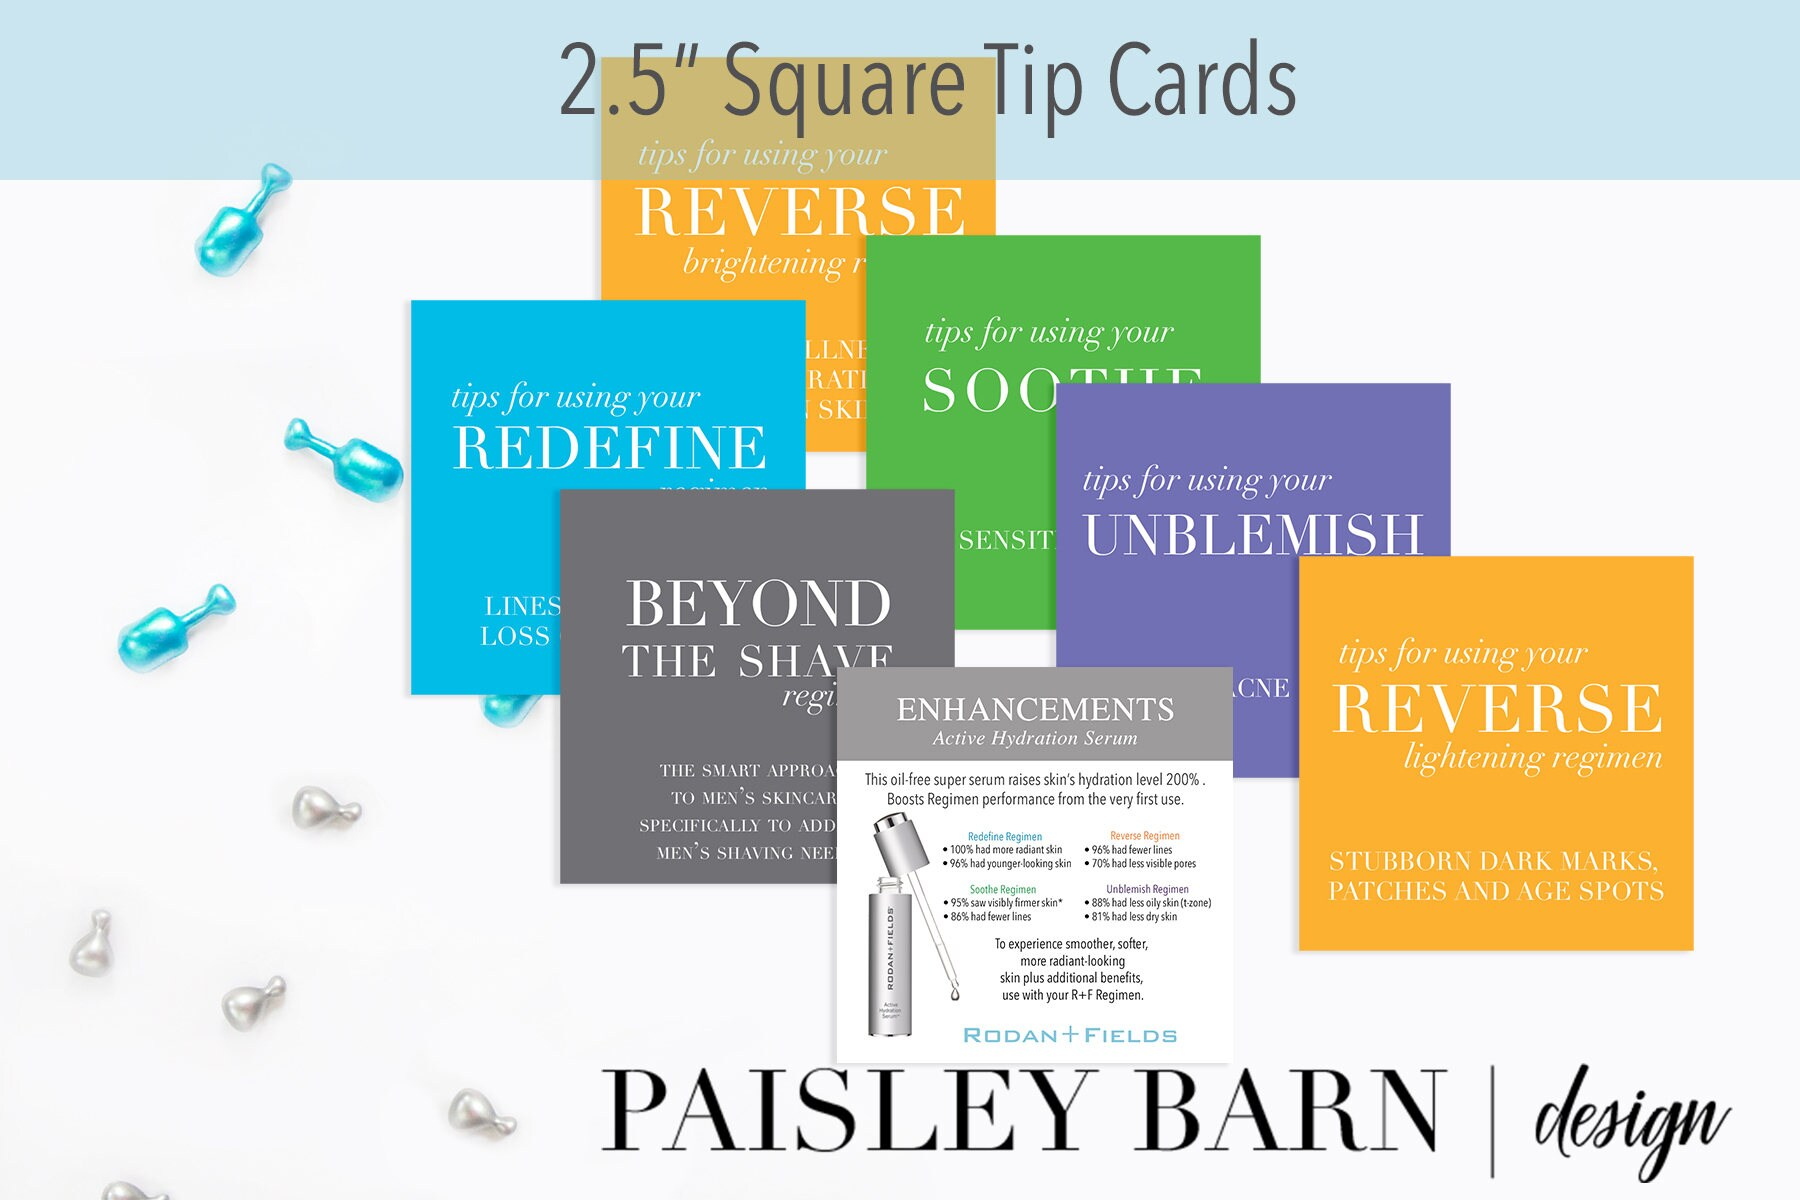 25 Square Tip Cards mini facial RodanFields travel